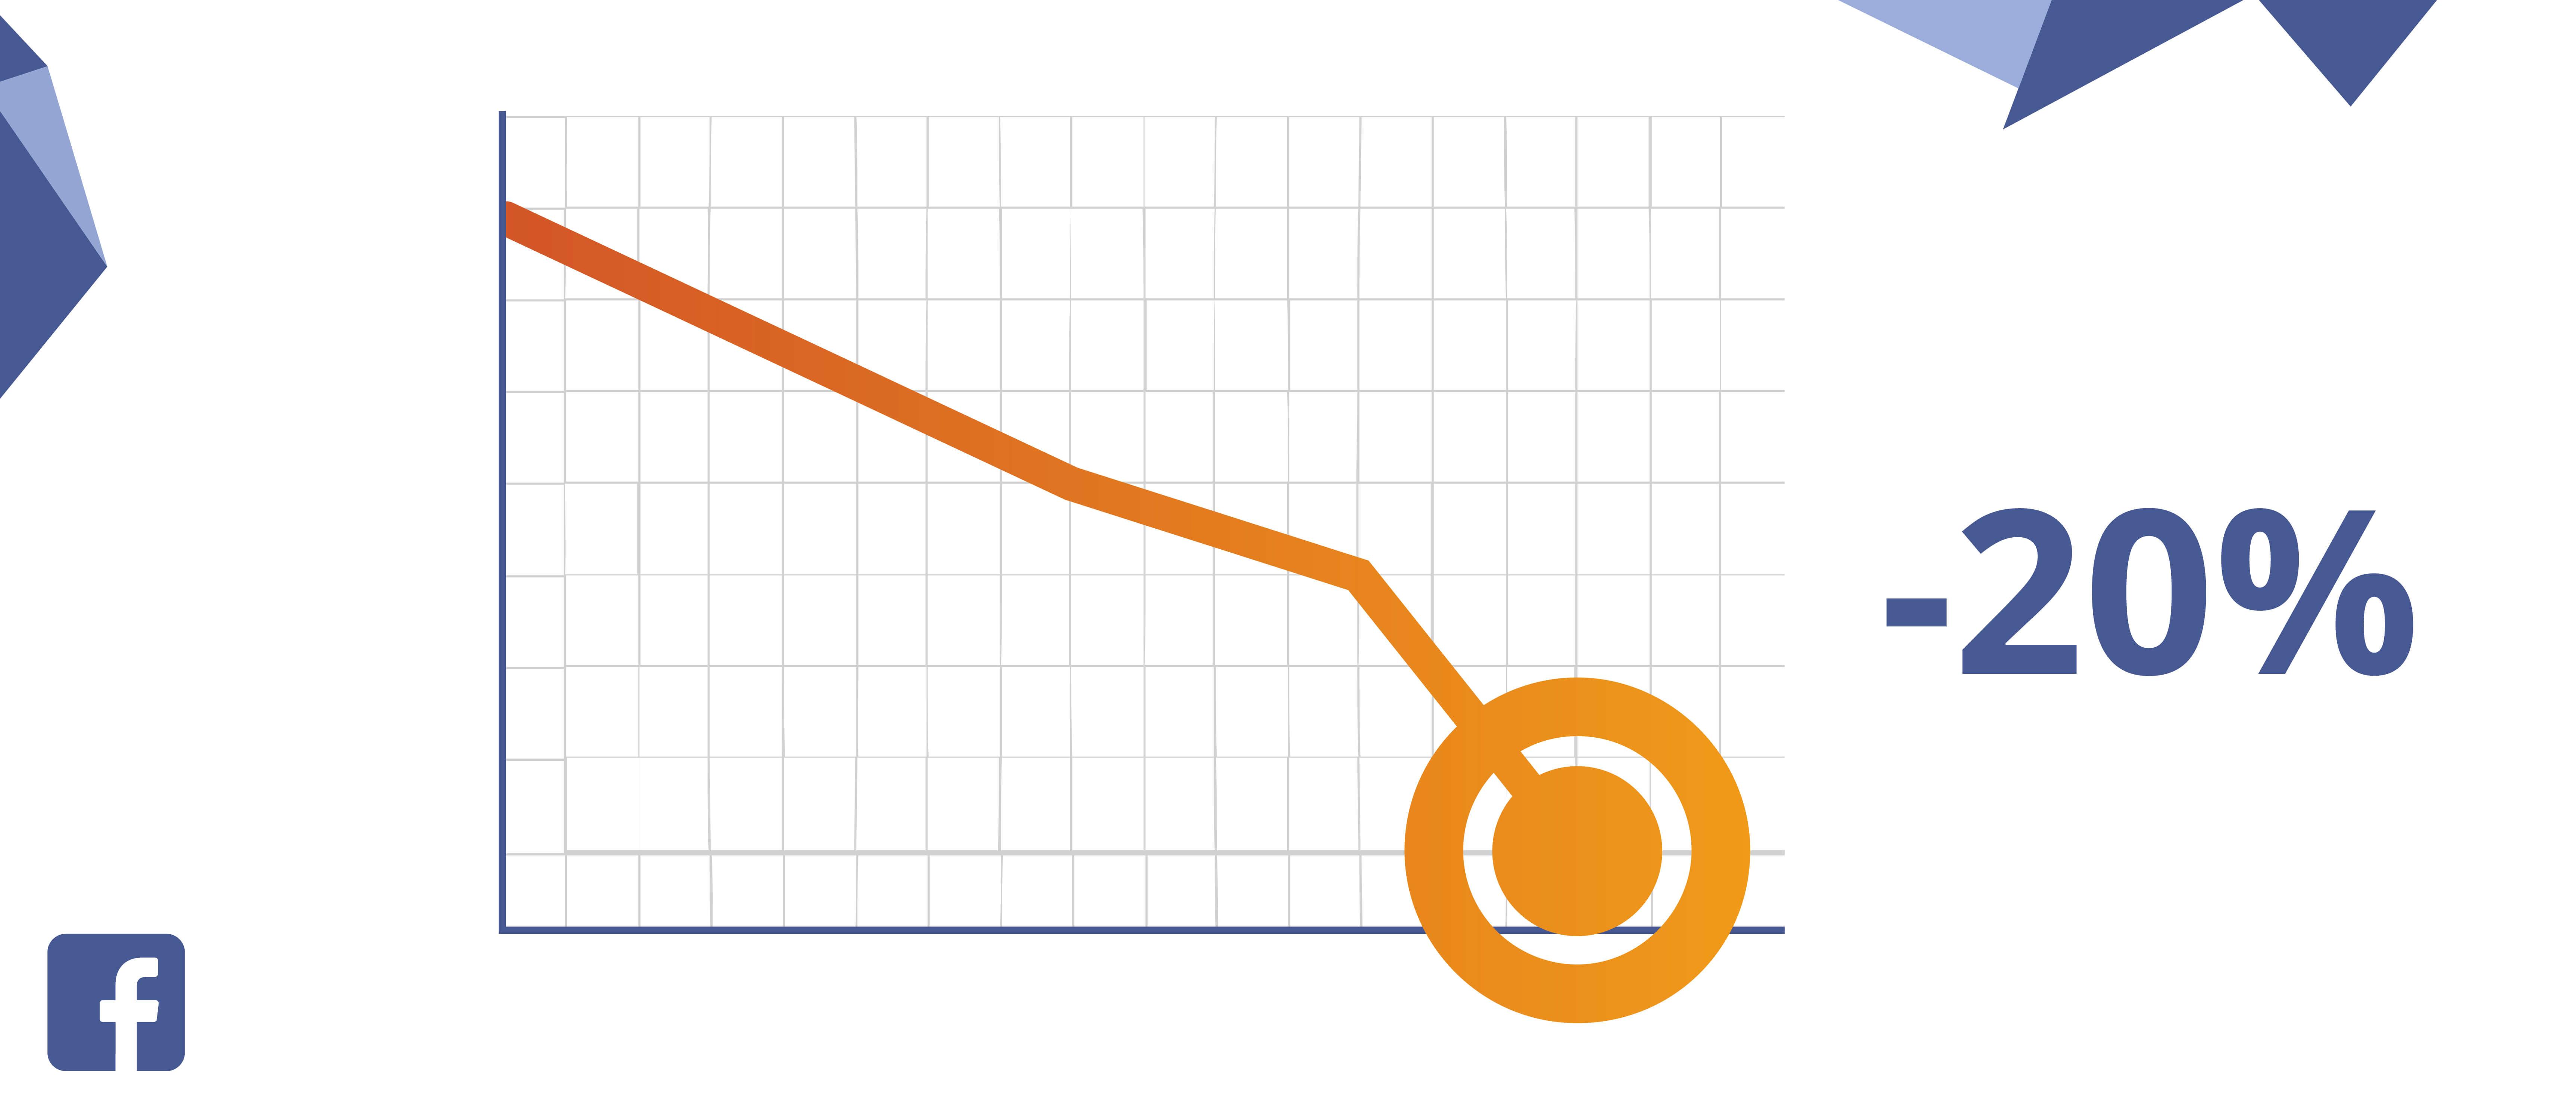 Aktualizacia metriky organickeho dosahu